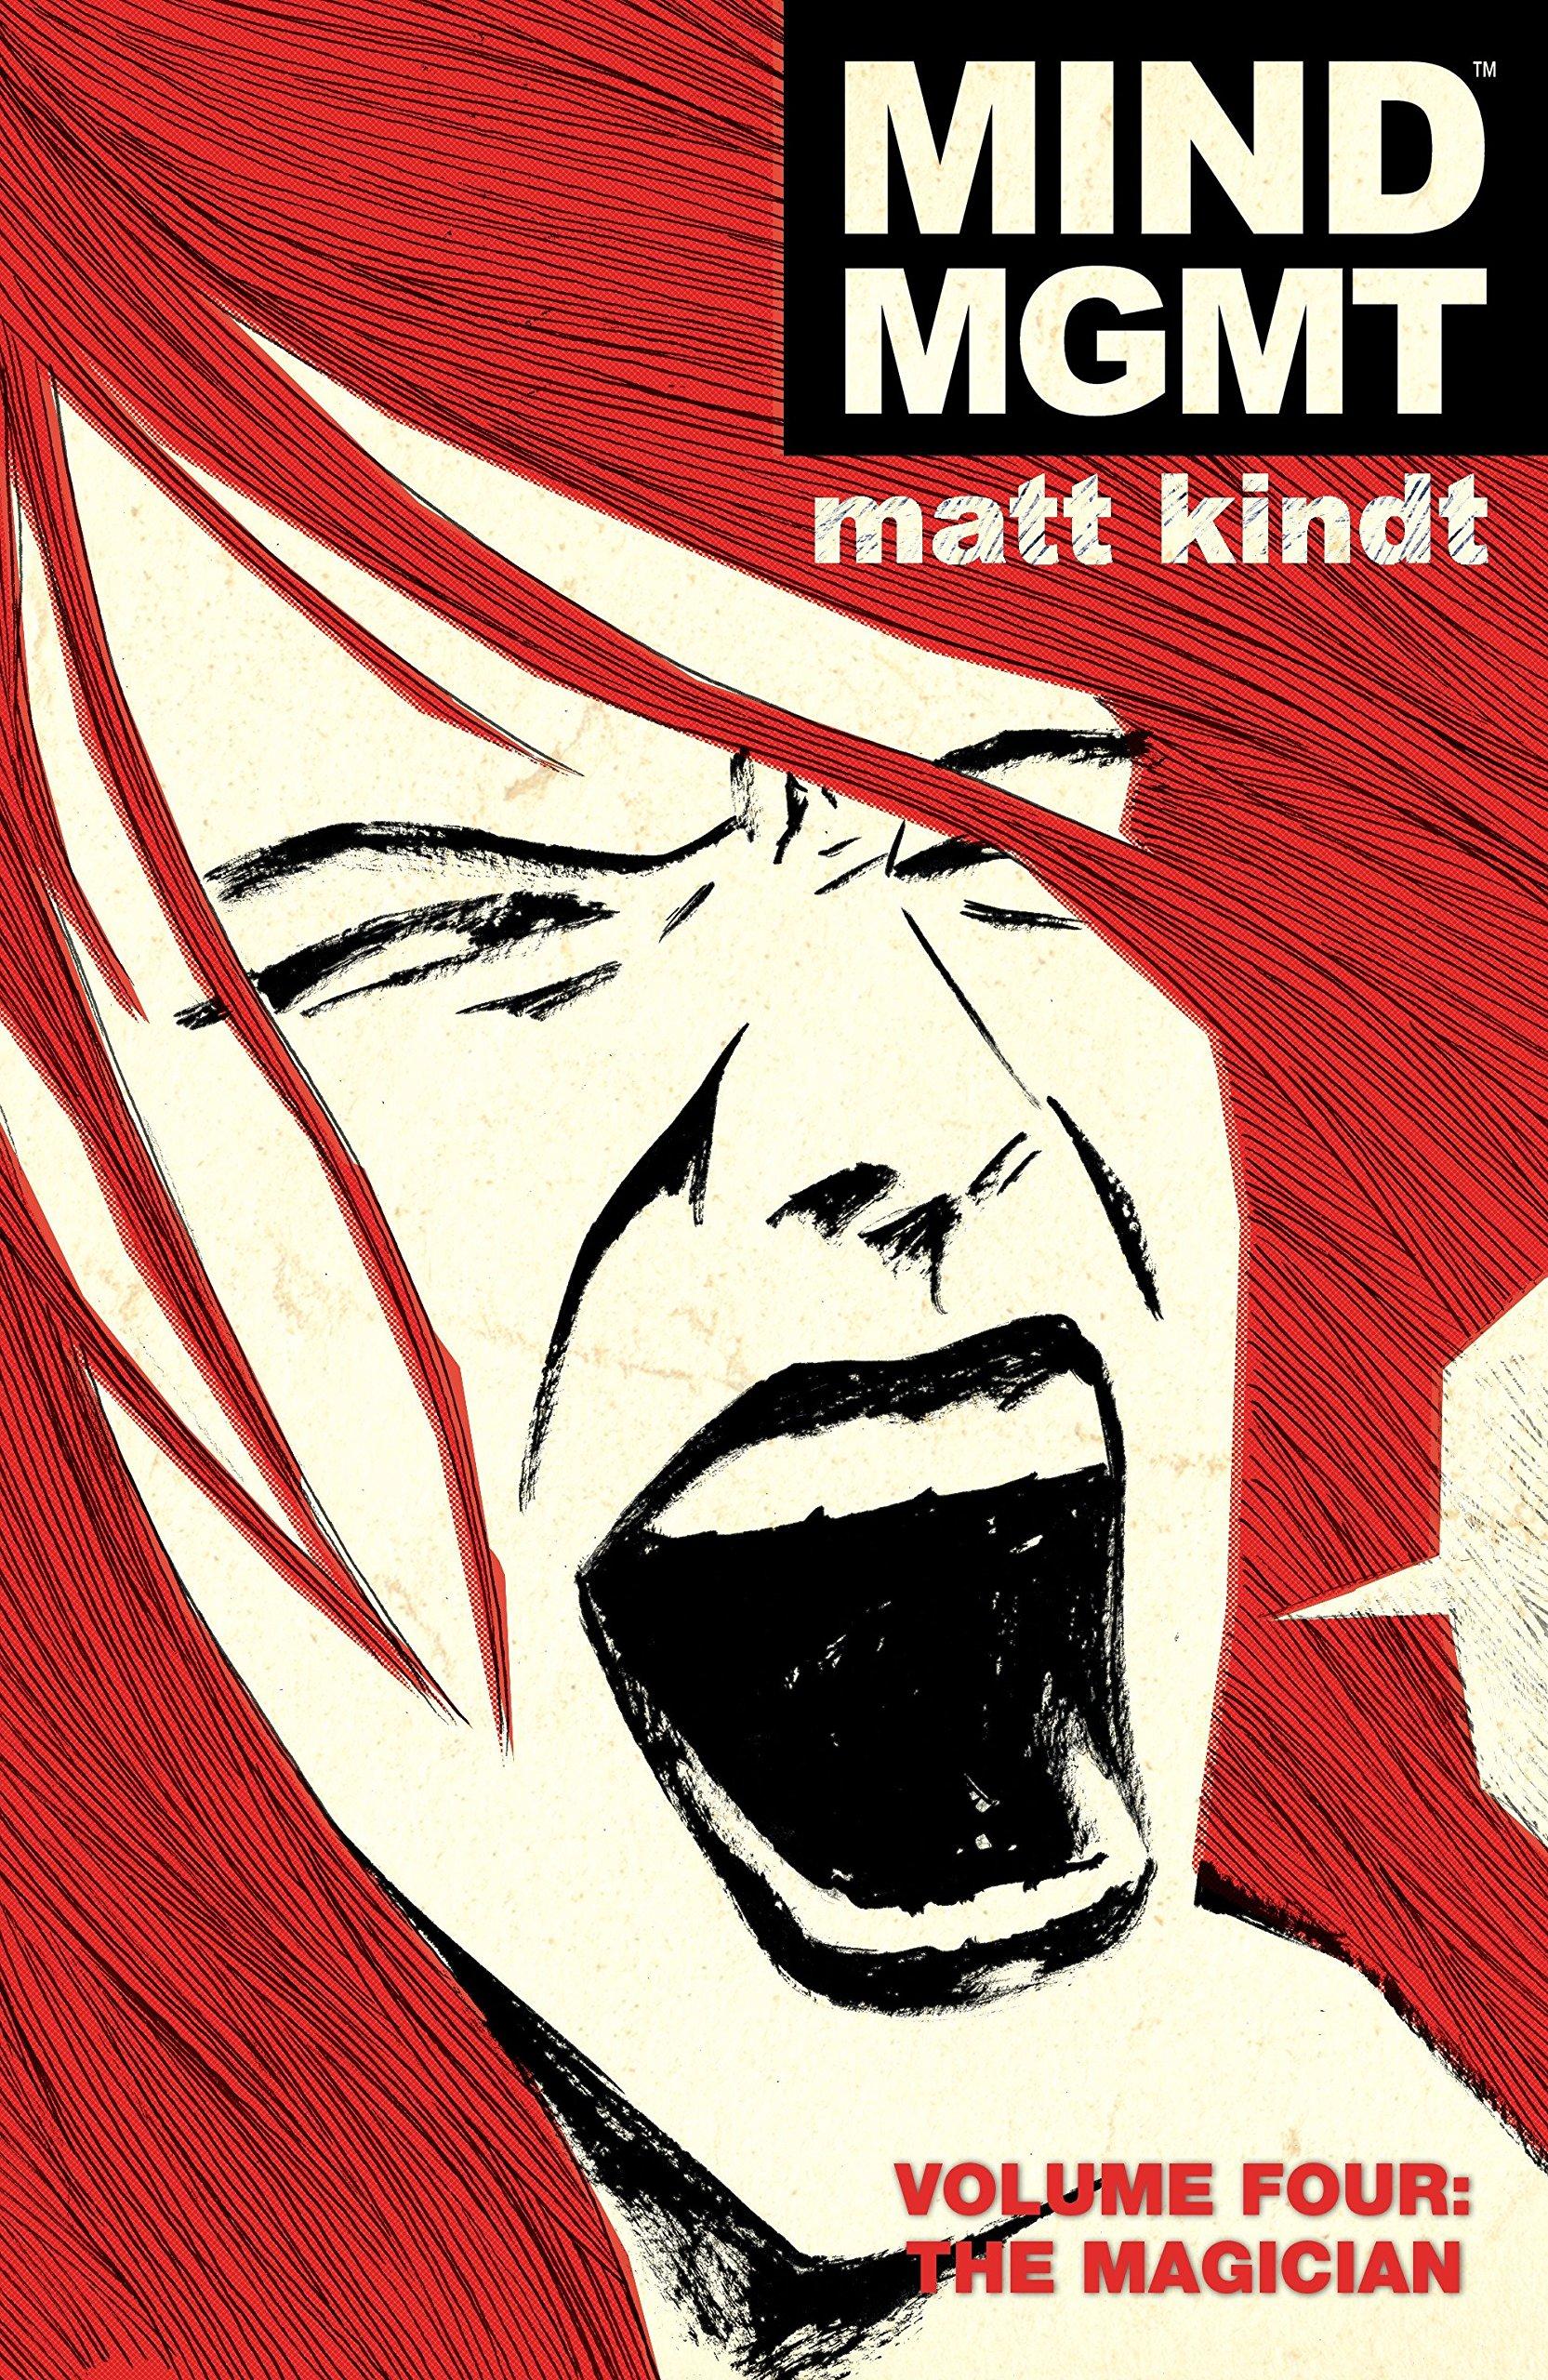 MIND MGMT Volume 4: The Magician by Dark Horse Originals